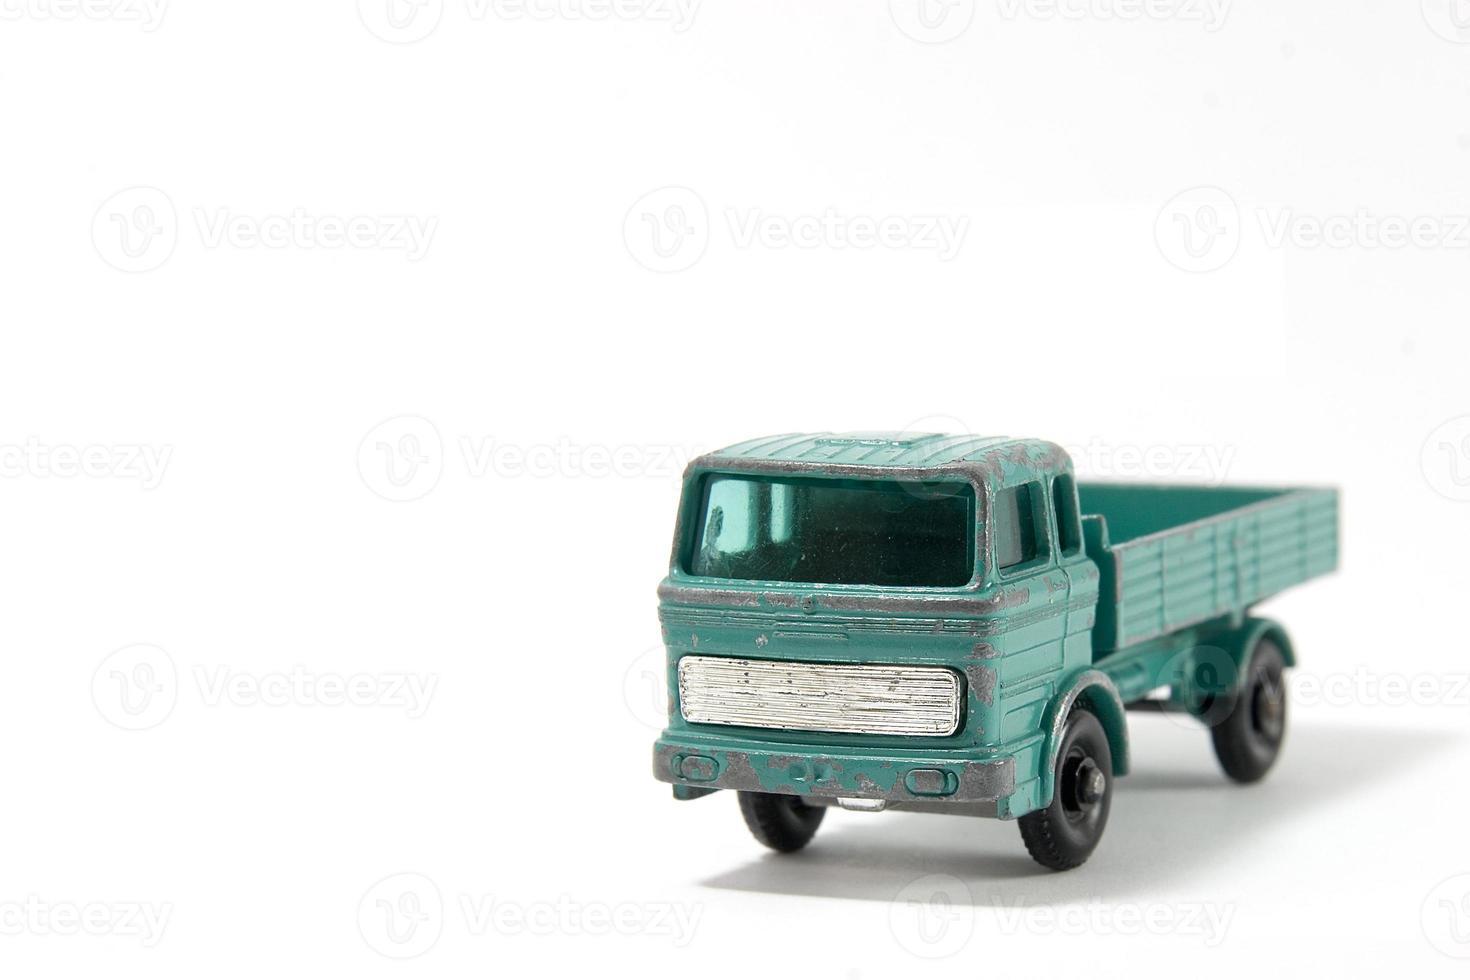 caminhão vintage foto